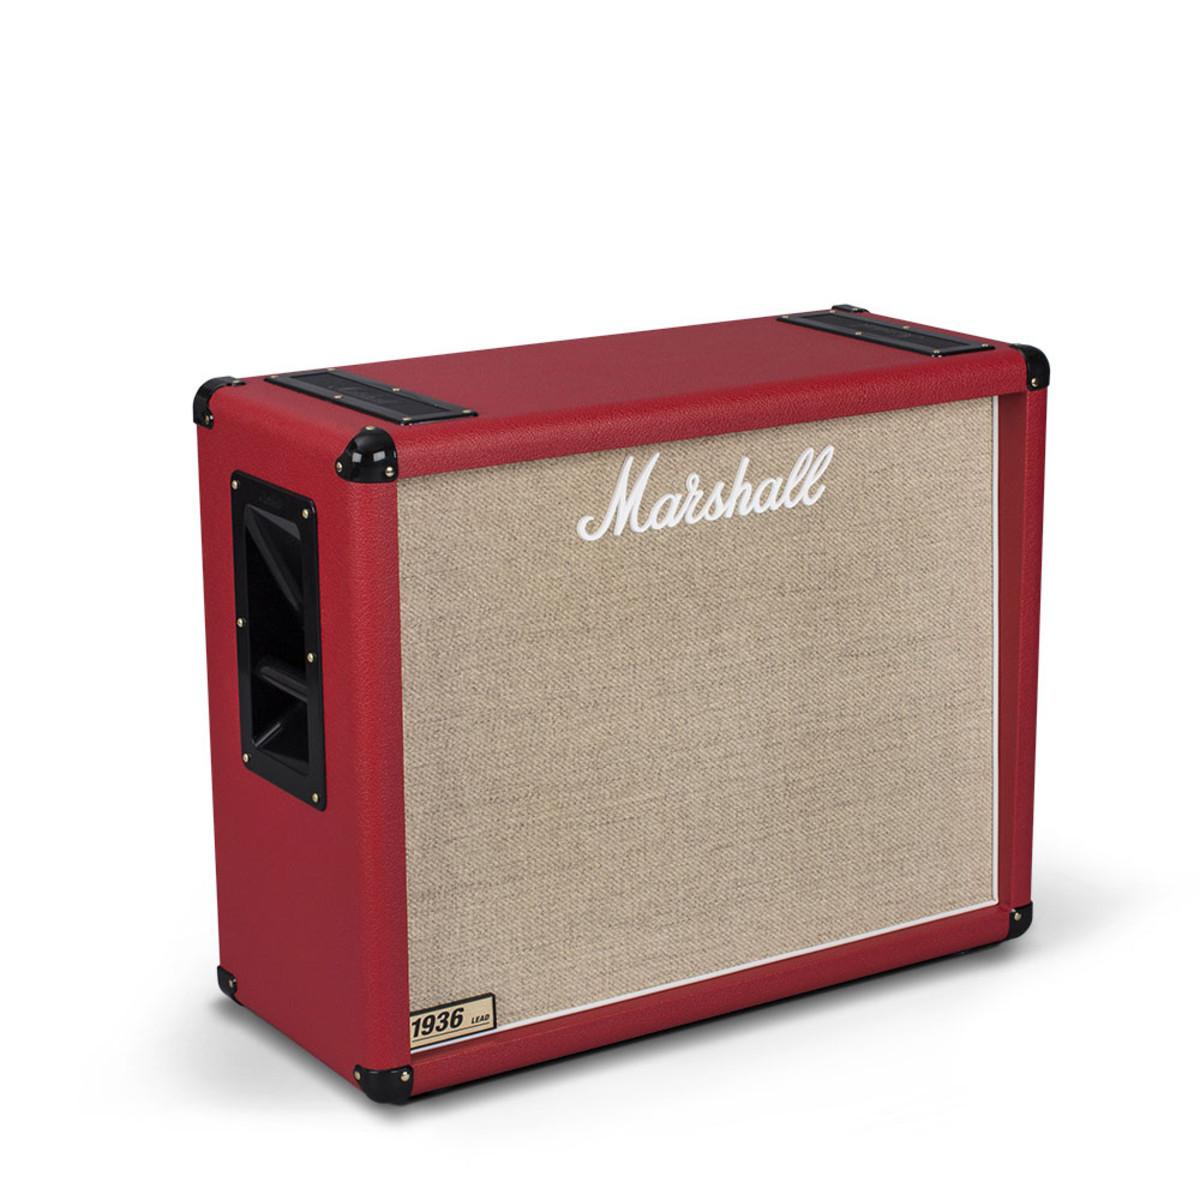 marshall 1936 2x12 guitar speaker cab red at. Black Bedroom Furniture Sets. Home Design Ideas